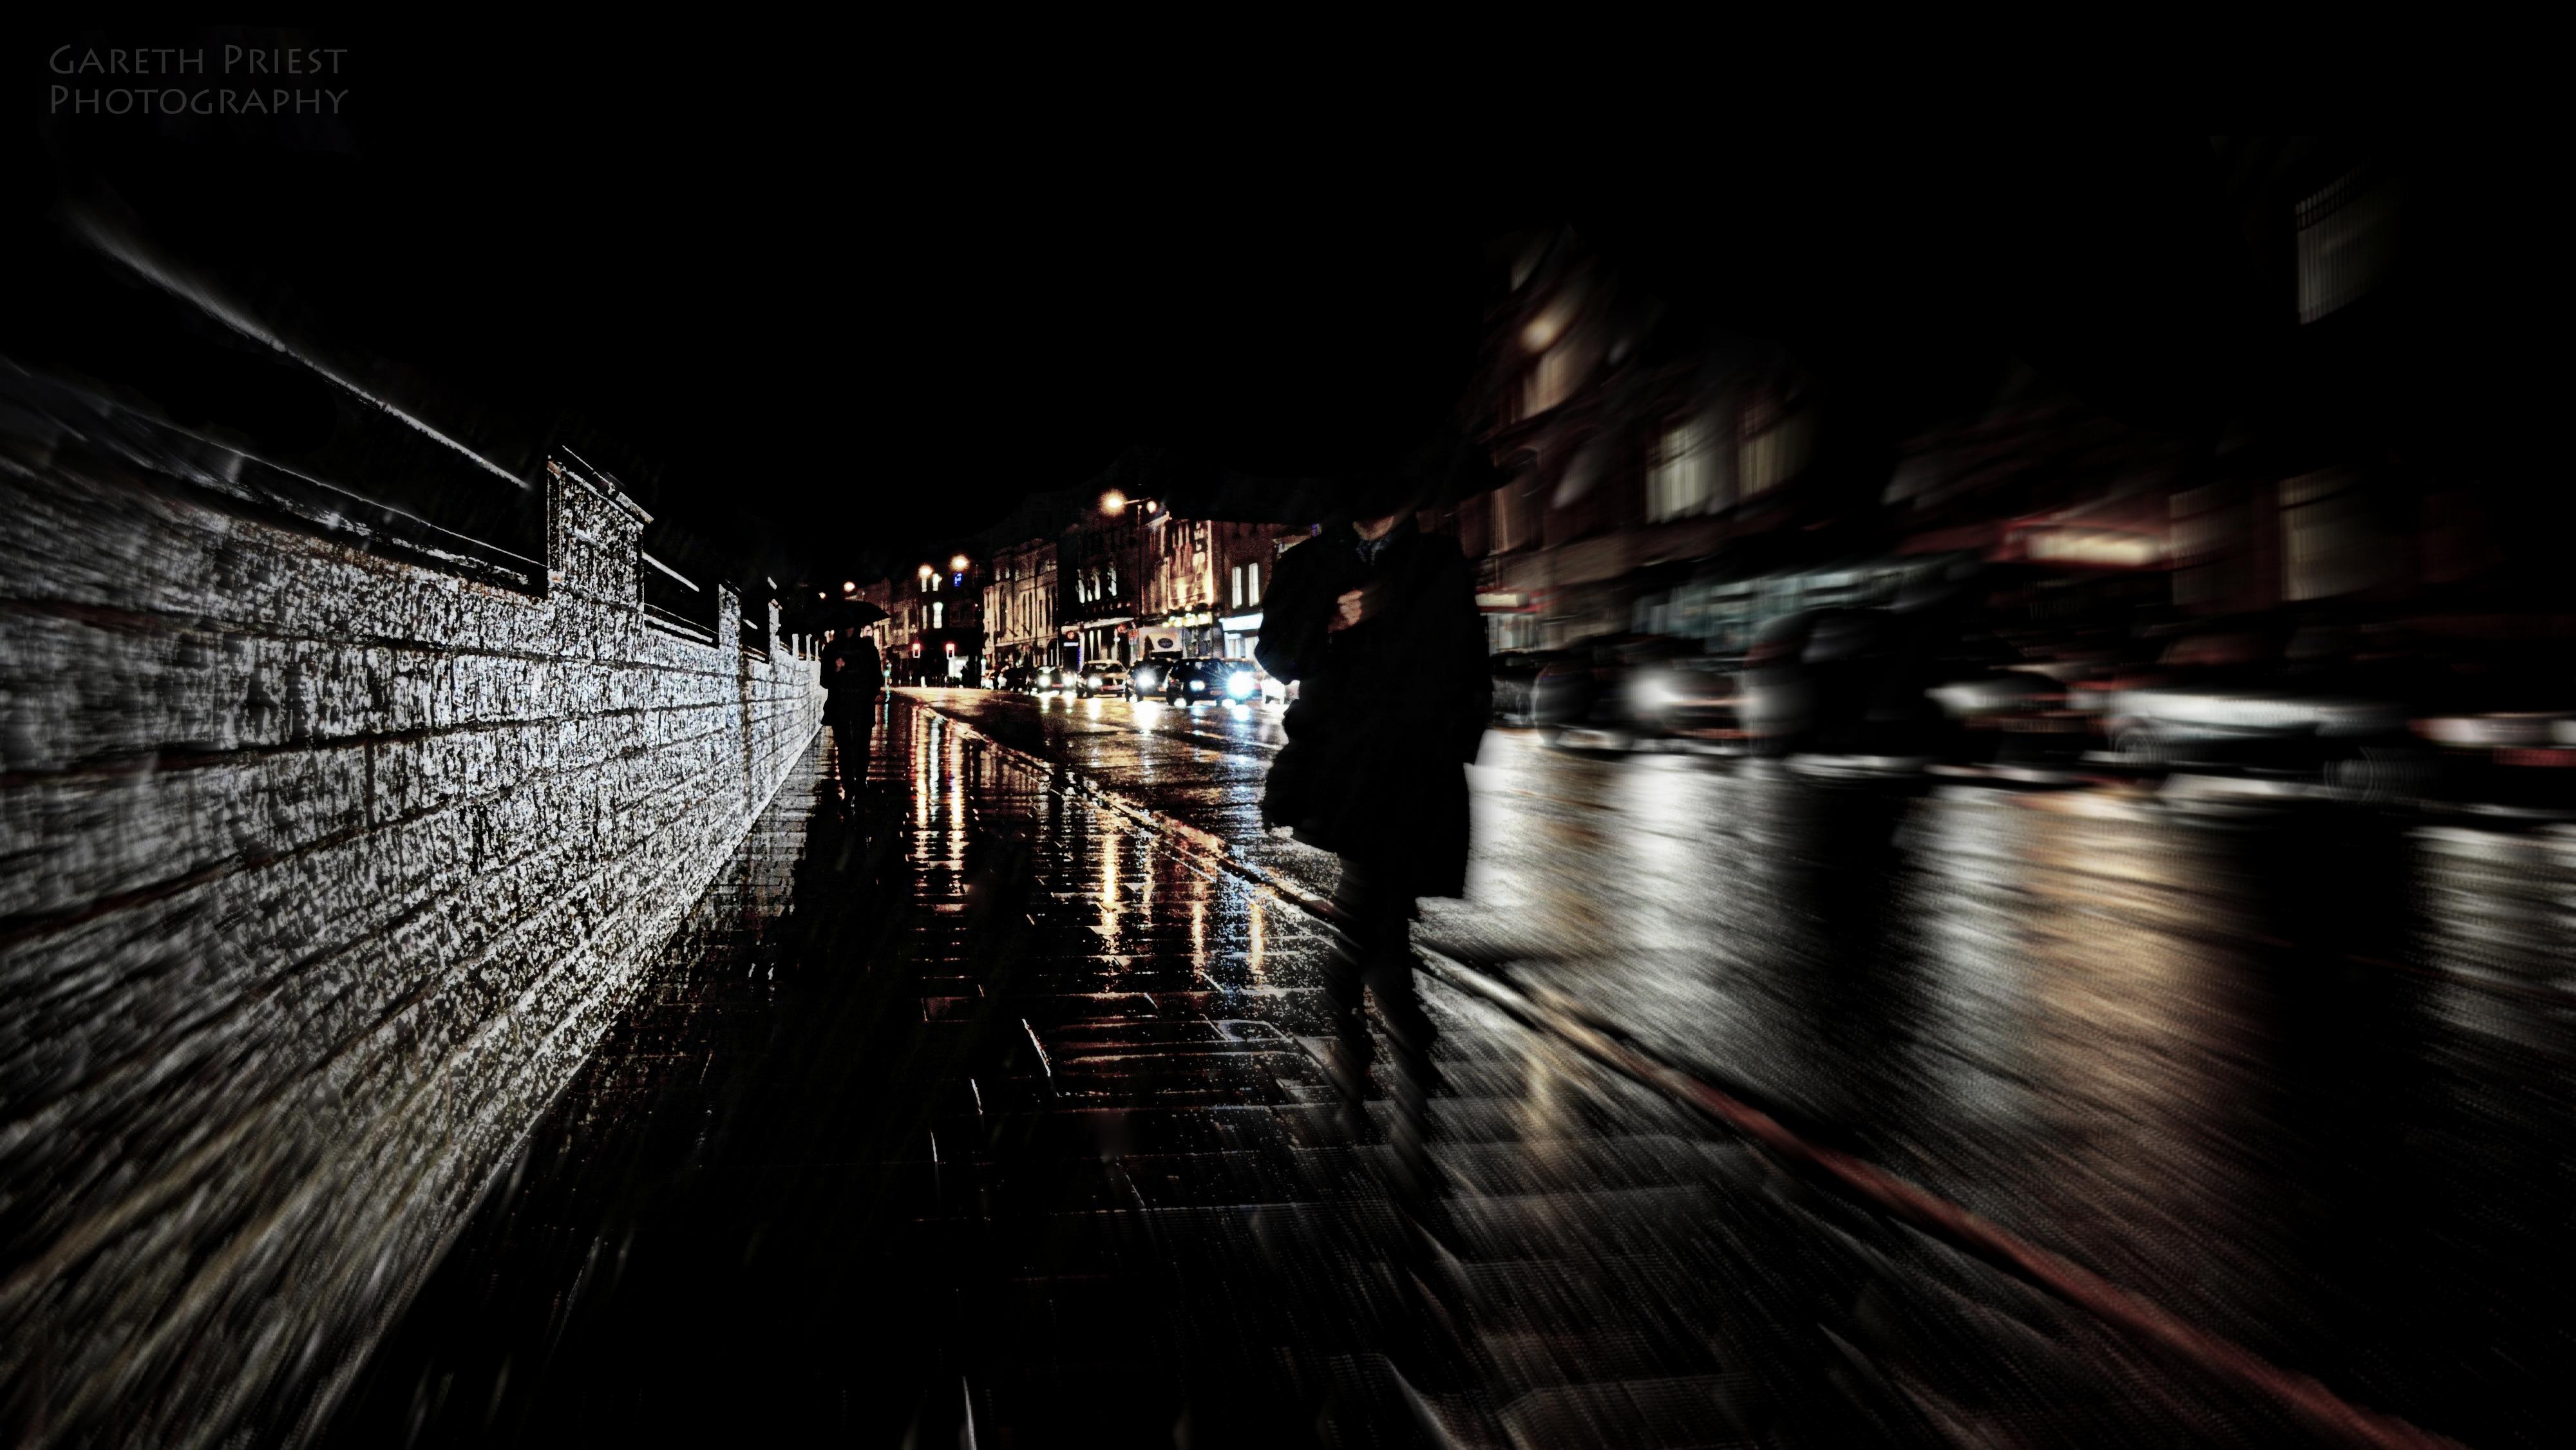 Wallpaper Life Road Street City UK Winter Light Shadow Portrait People Urban Inspiration Man Motion Reflection Bus ART Cars Rain